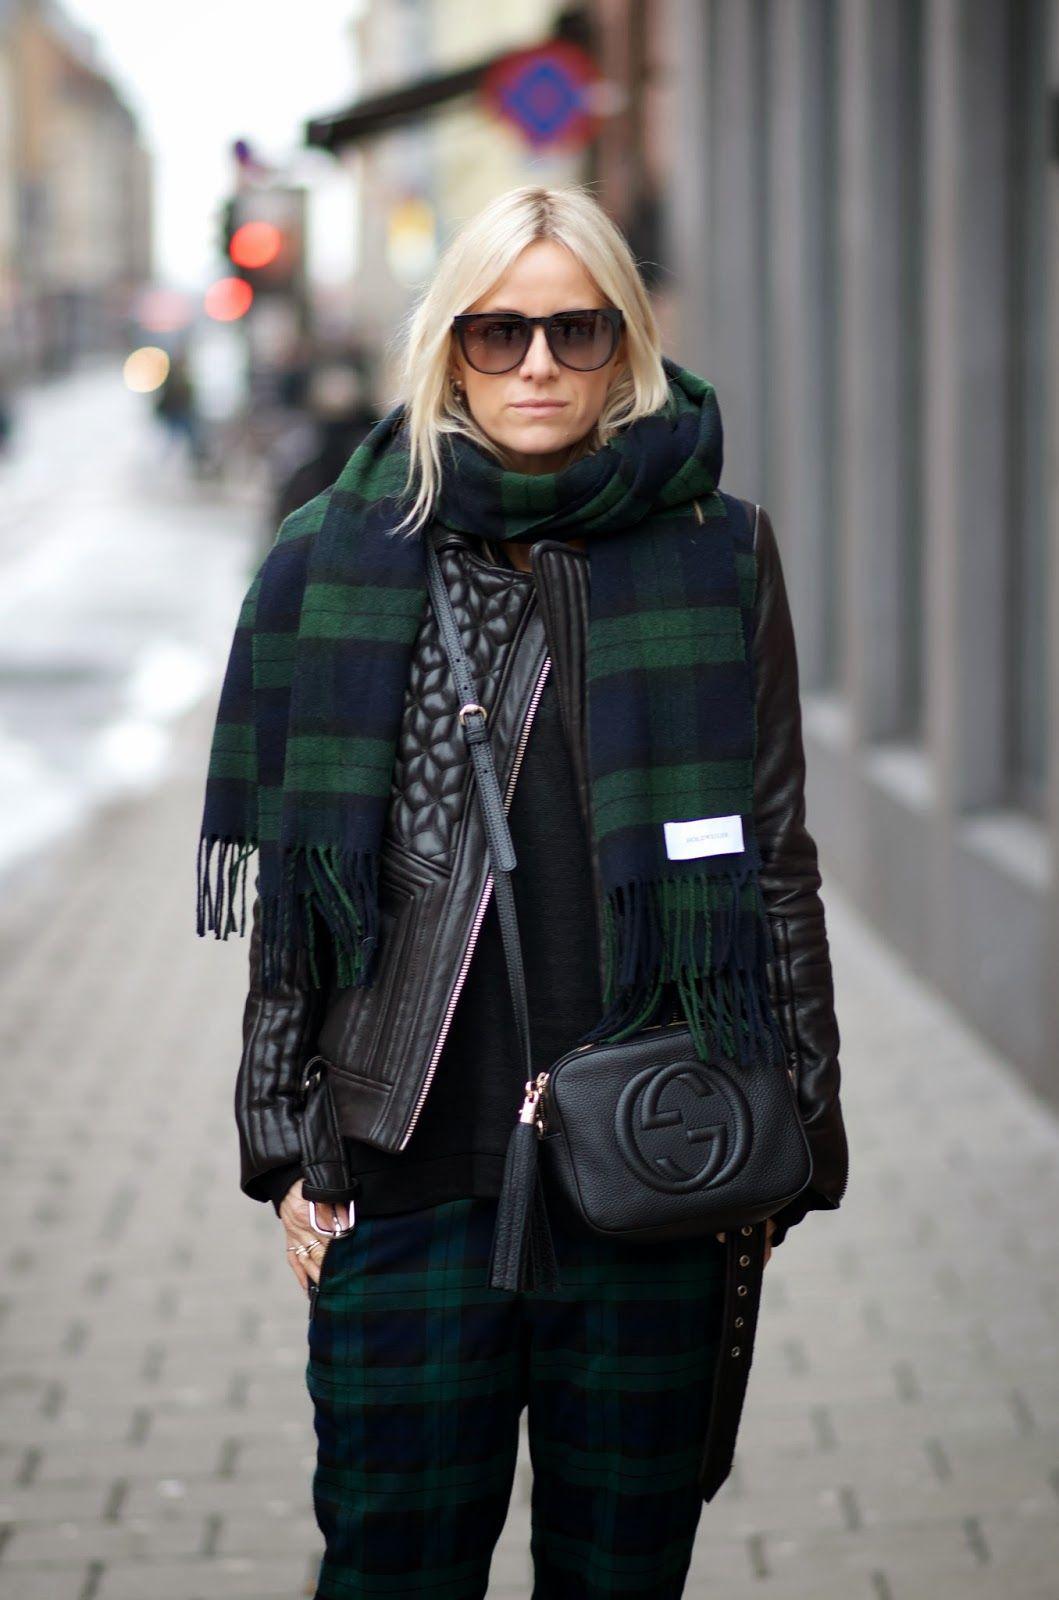 Gucci disco bag outfit | All the Things Etc Handbag Lust | Gucci Soho Disco | Dreams u0026 bags ...